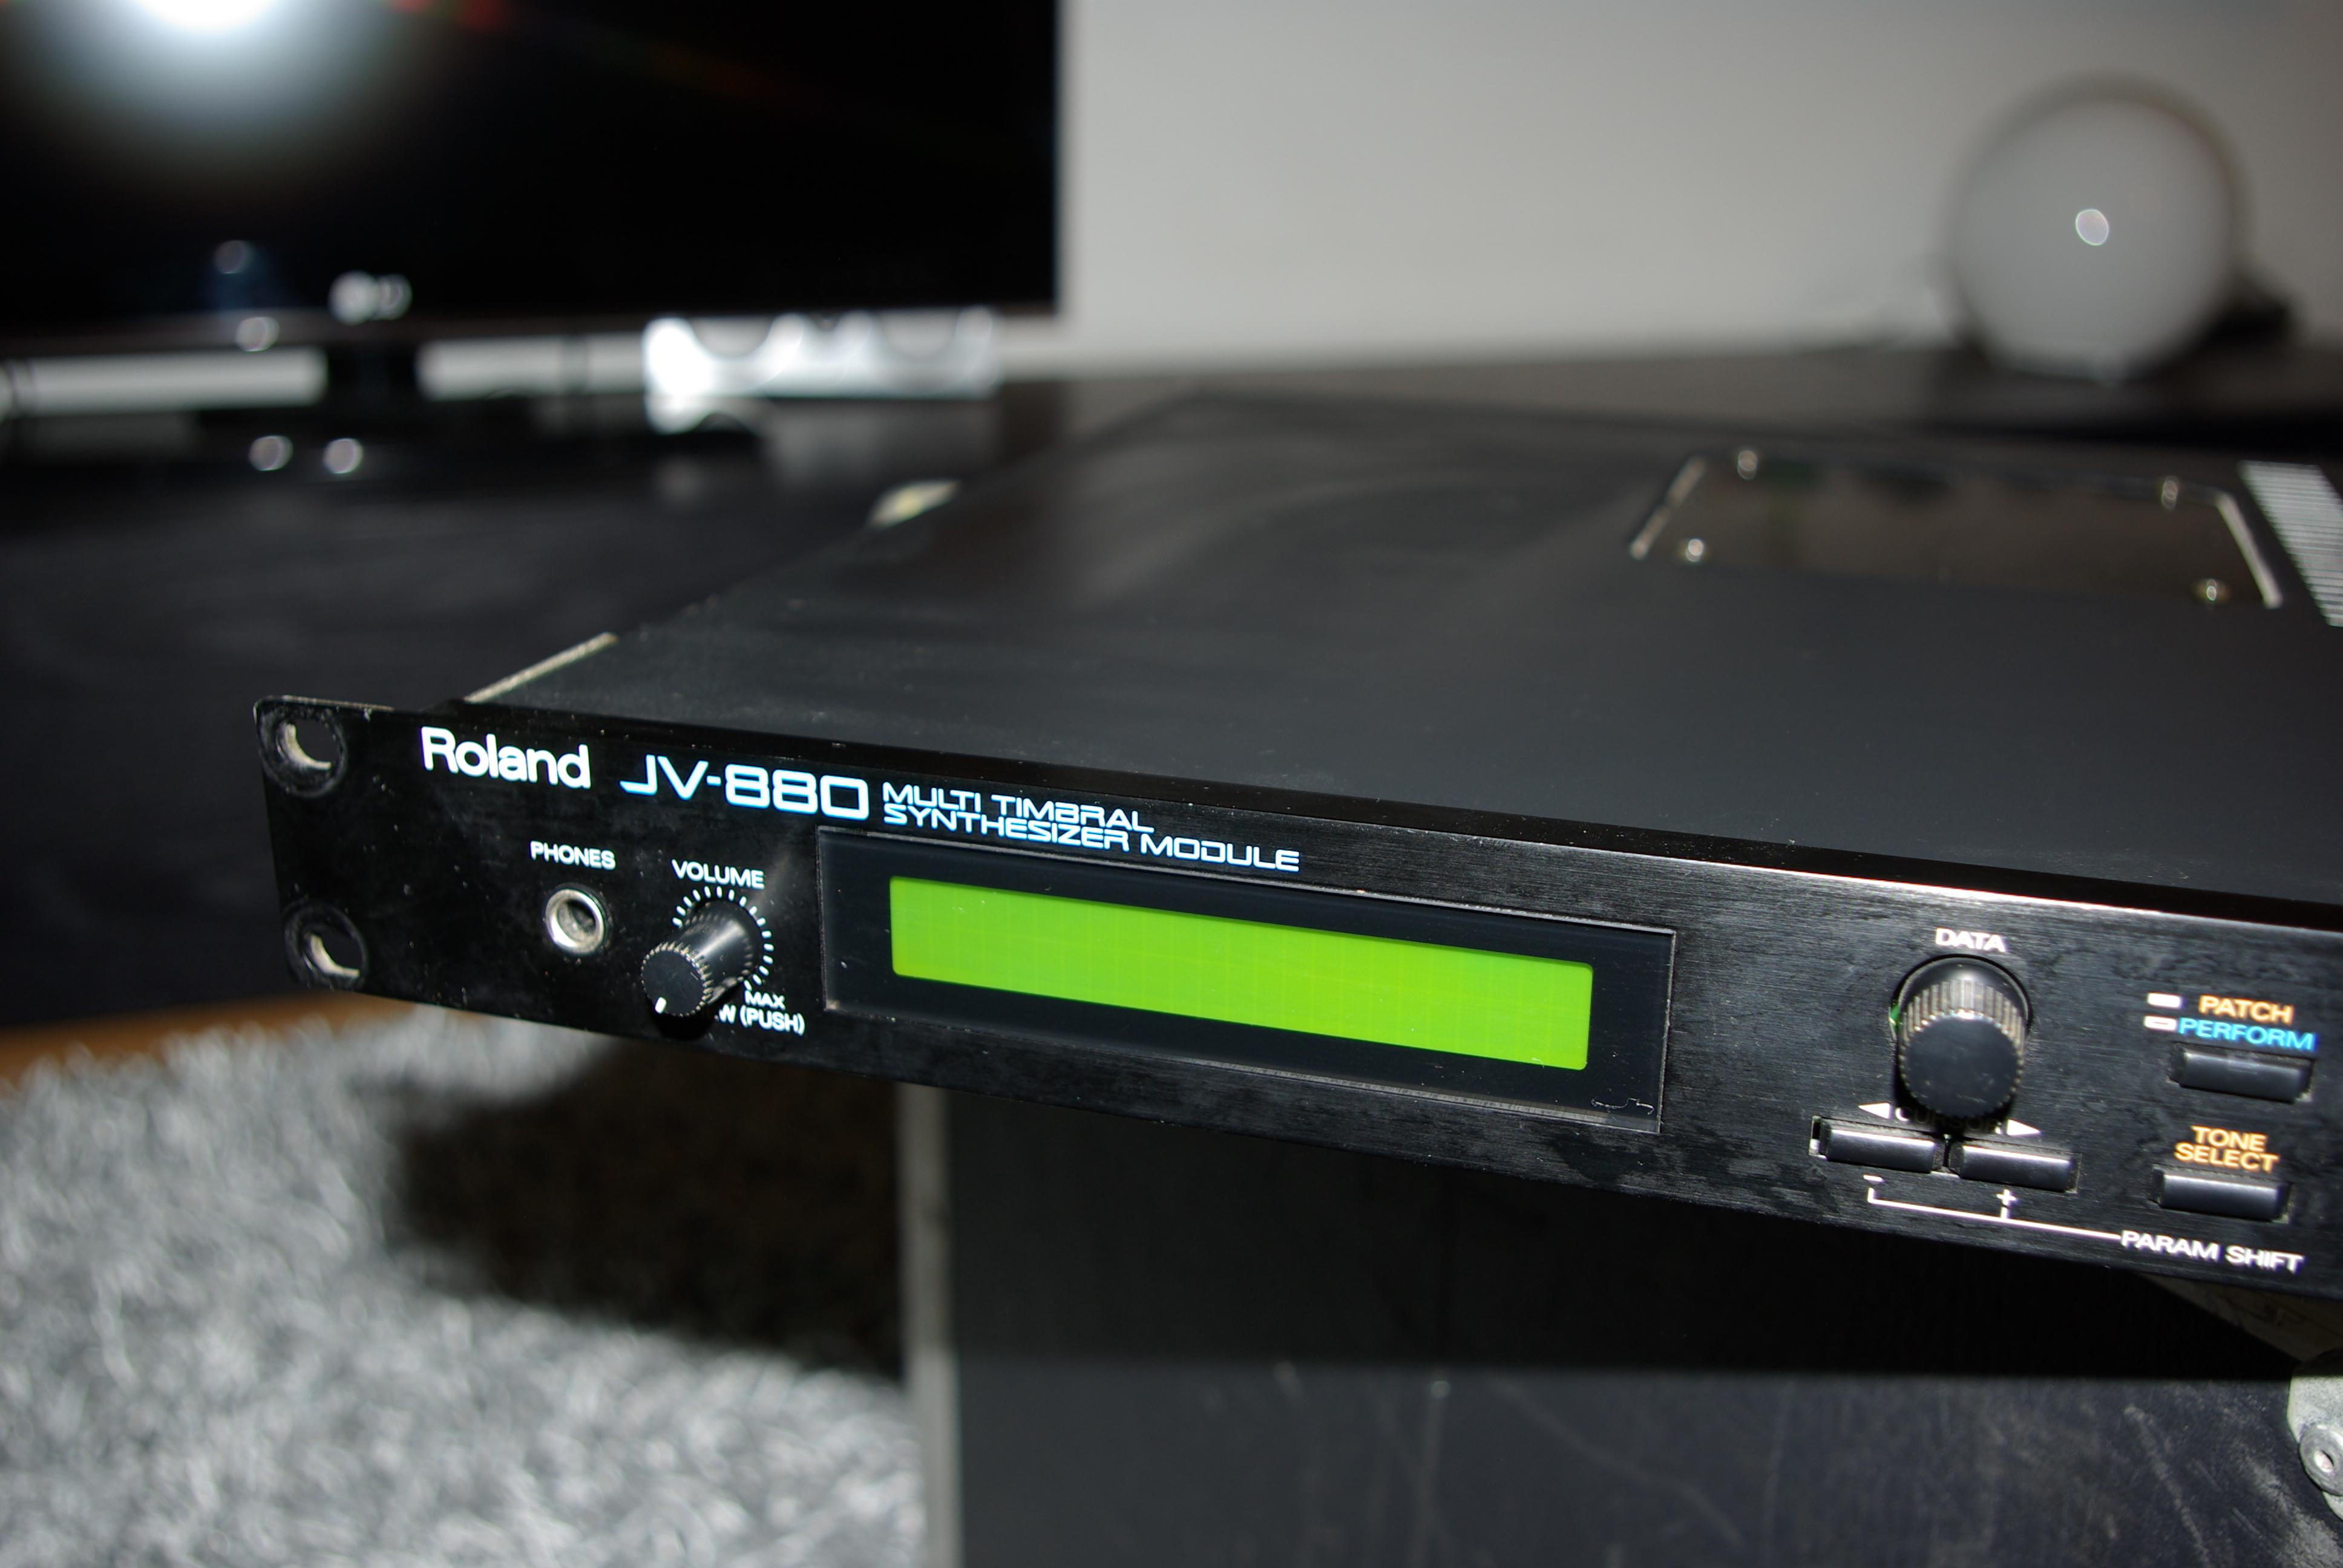 roland jv 880 image 245888 audiofanzine rh en audiofanzine com Roland JV 880 Sound Module roland jv 880 manual pdf